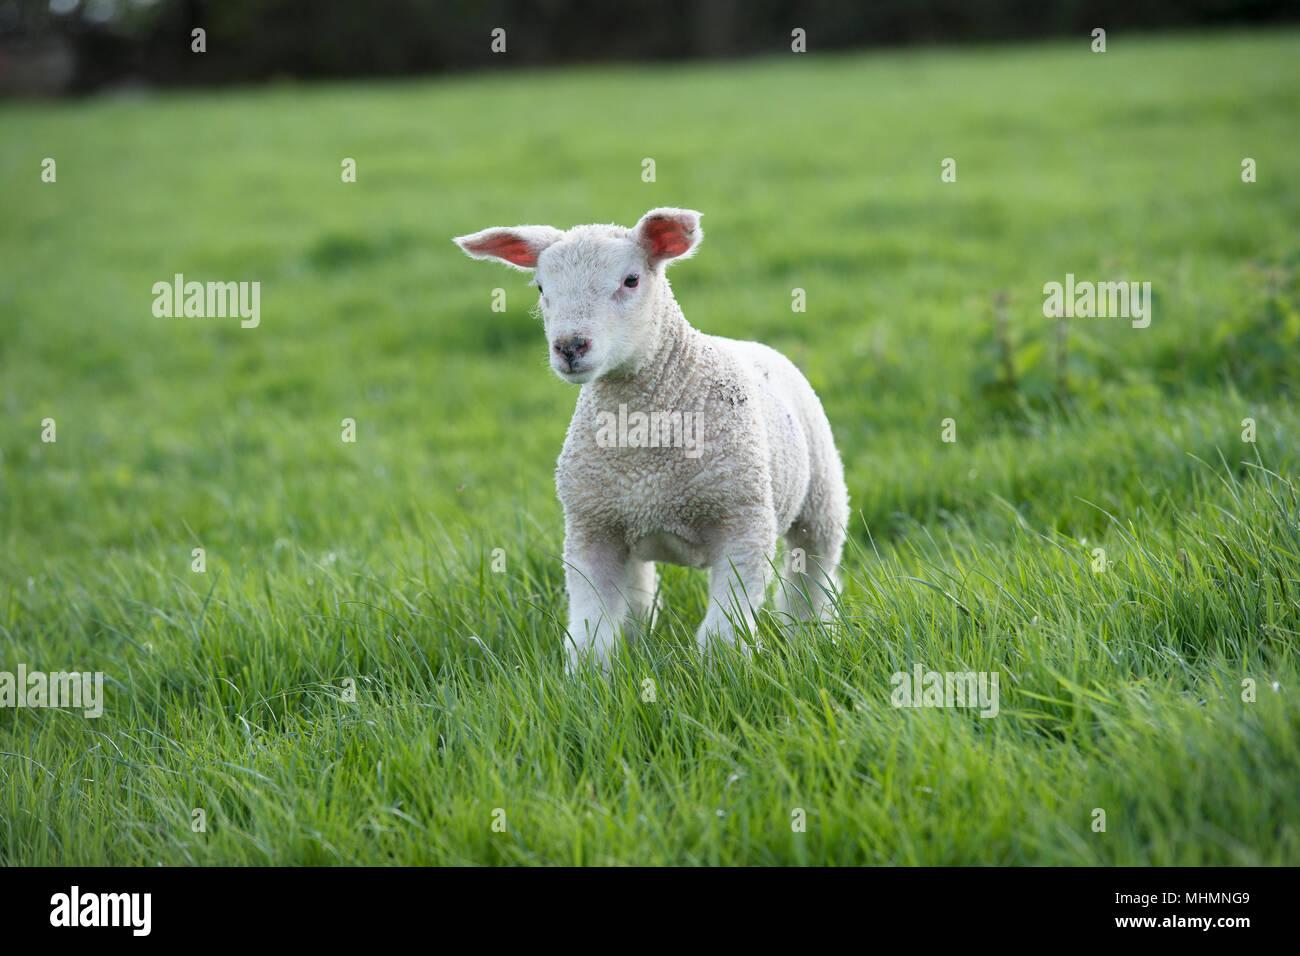 baby lamb - Stock Image